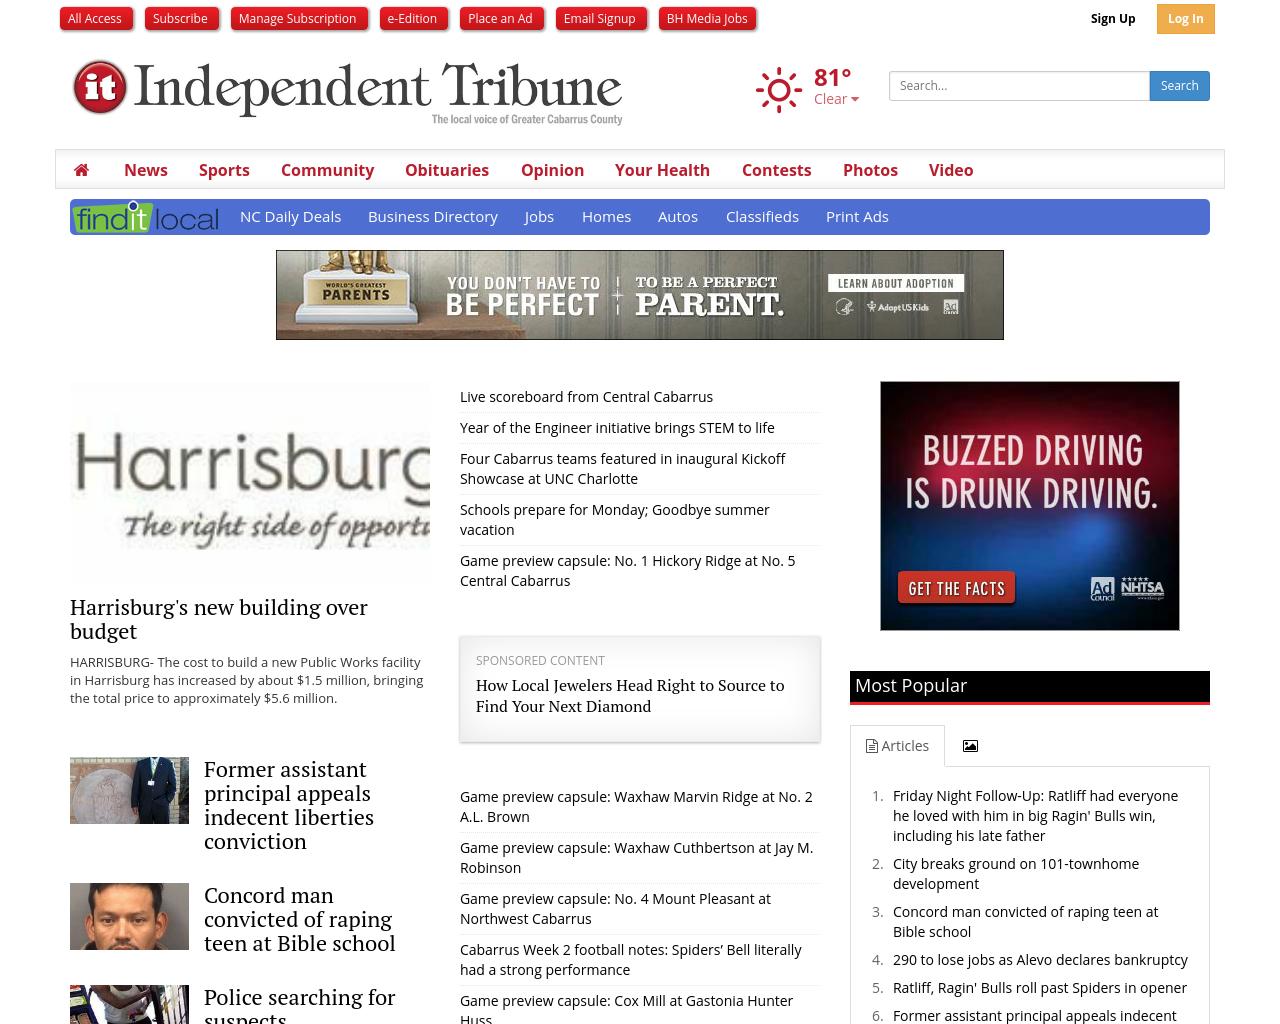 Independent-Tribune-Advertising-Reviews-Pricing